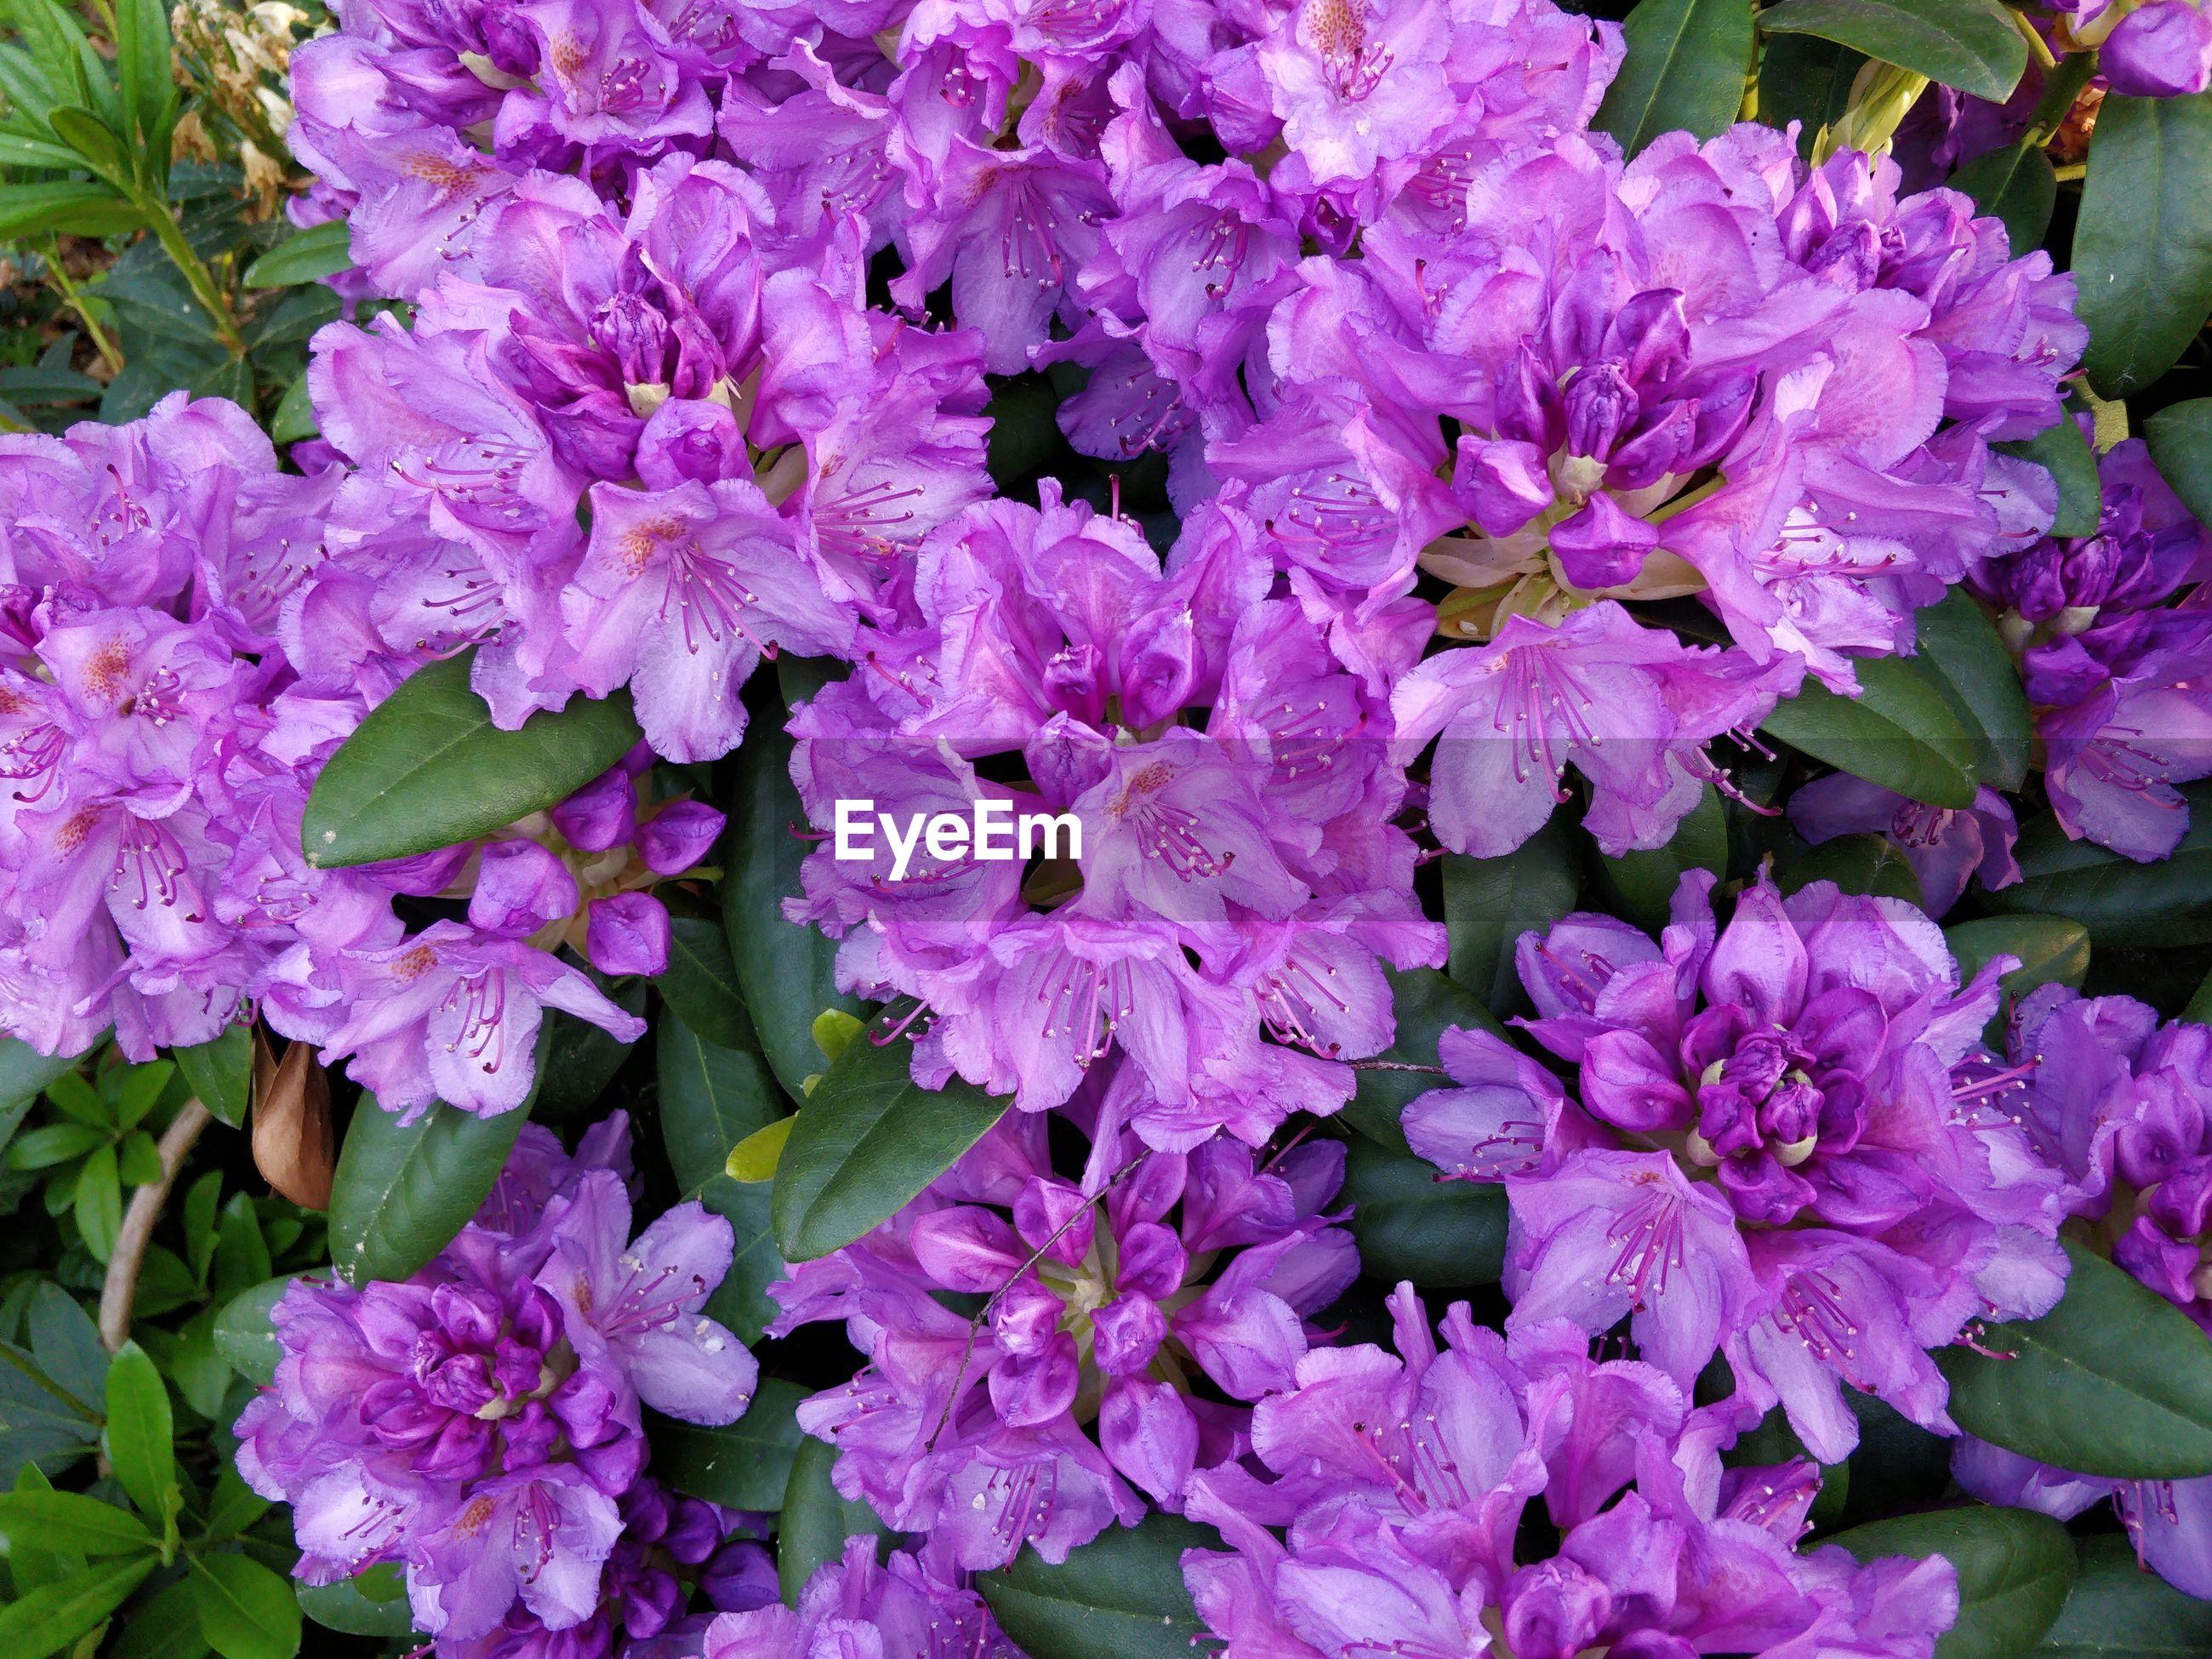 CLOSE-UP OF PINK FLOWERING PURPLE FLOWERS